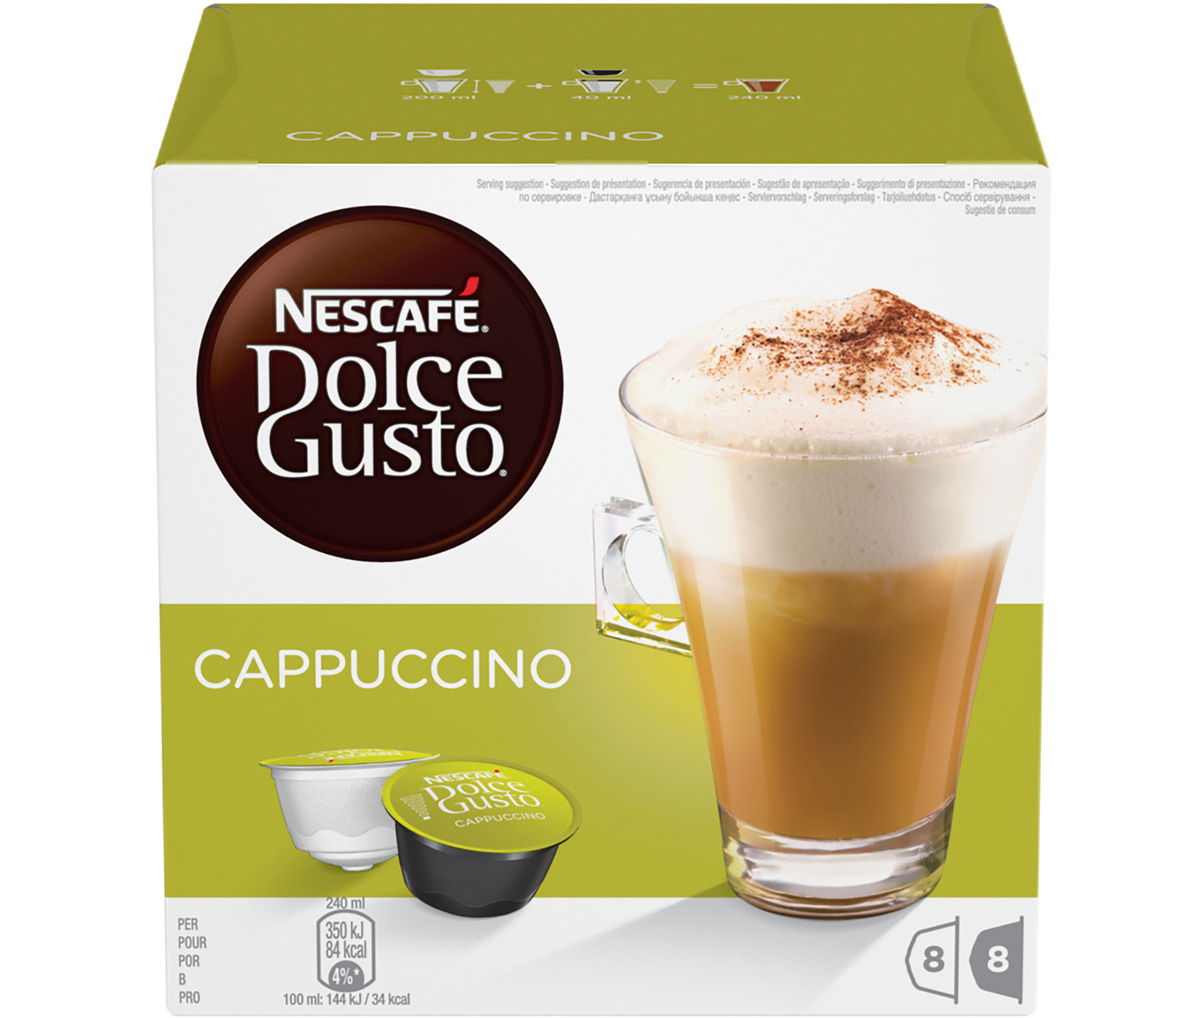 Nescafe Dolce Gusto Cappuccino кофе в капсулах, 16 шт nescafe dolce gusto cortado эспрессо с молоком кофе в капсулах 16 шт